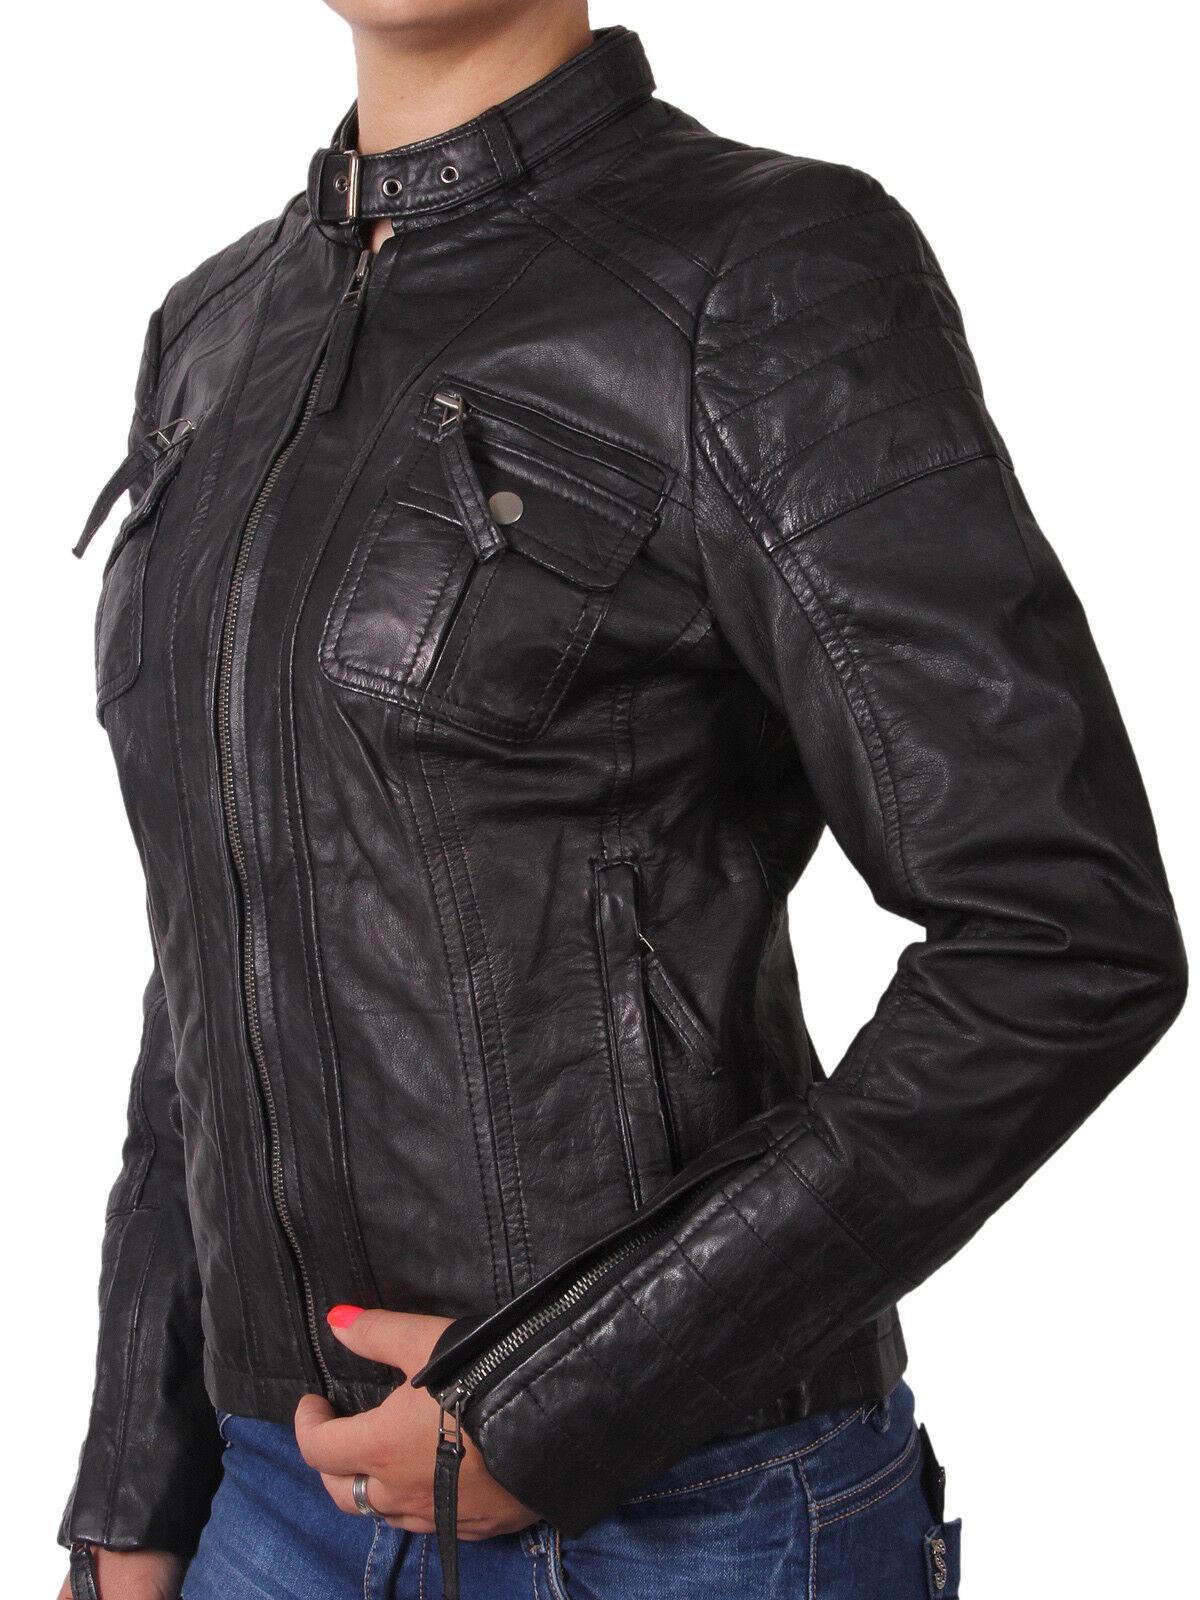 Brandslock damen Leather Biker Jacket Genuine LambSkin Vintage Retro Rock